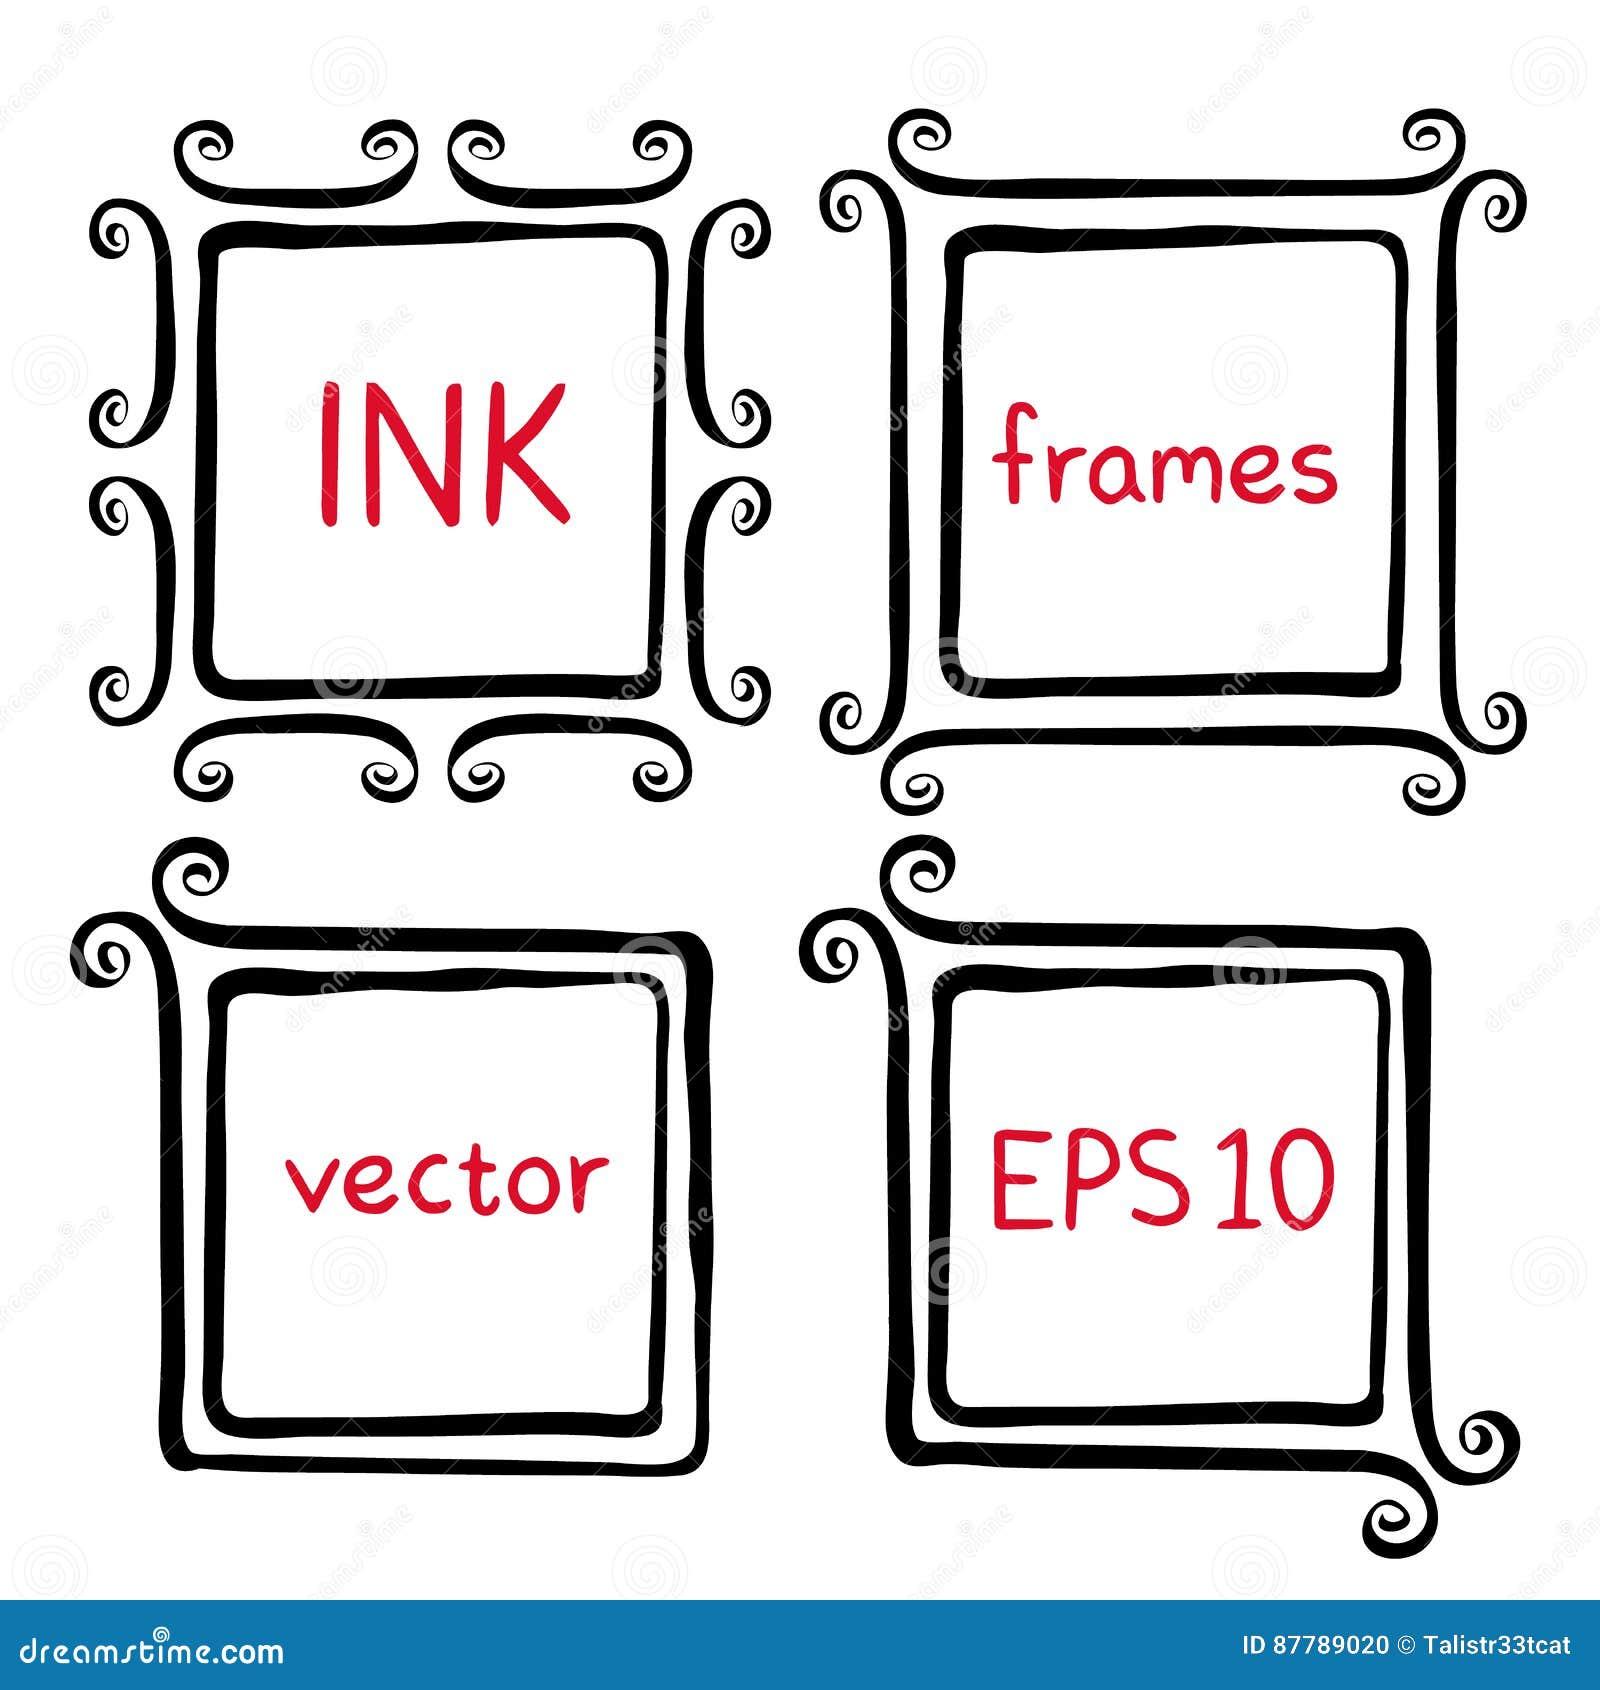 Hand painted ink frames stock vector. Illustration of divider - 87789020